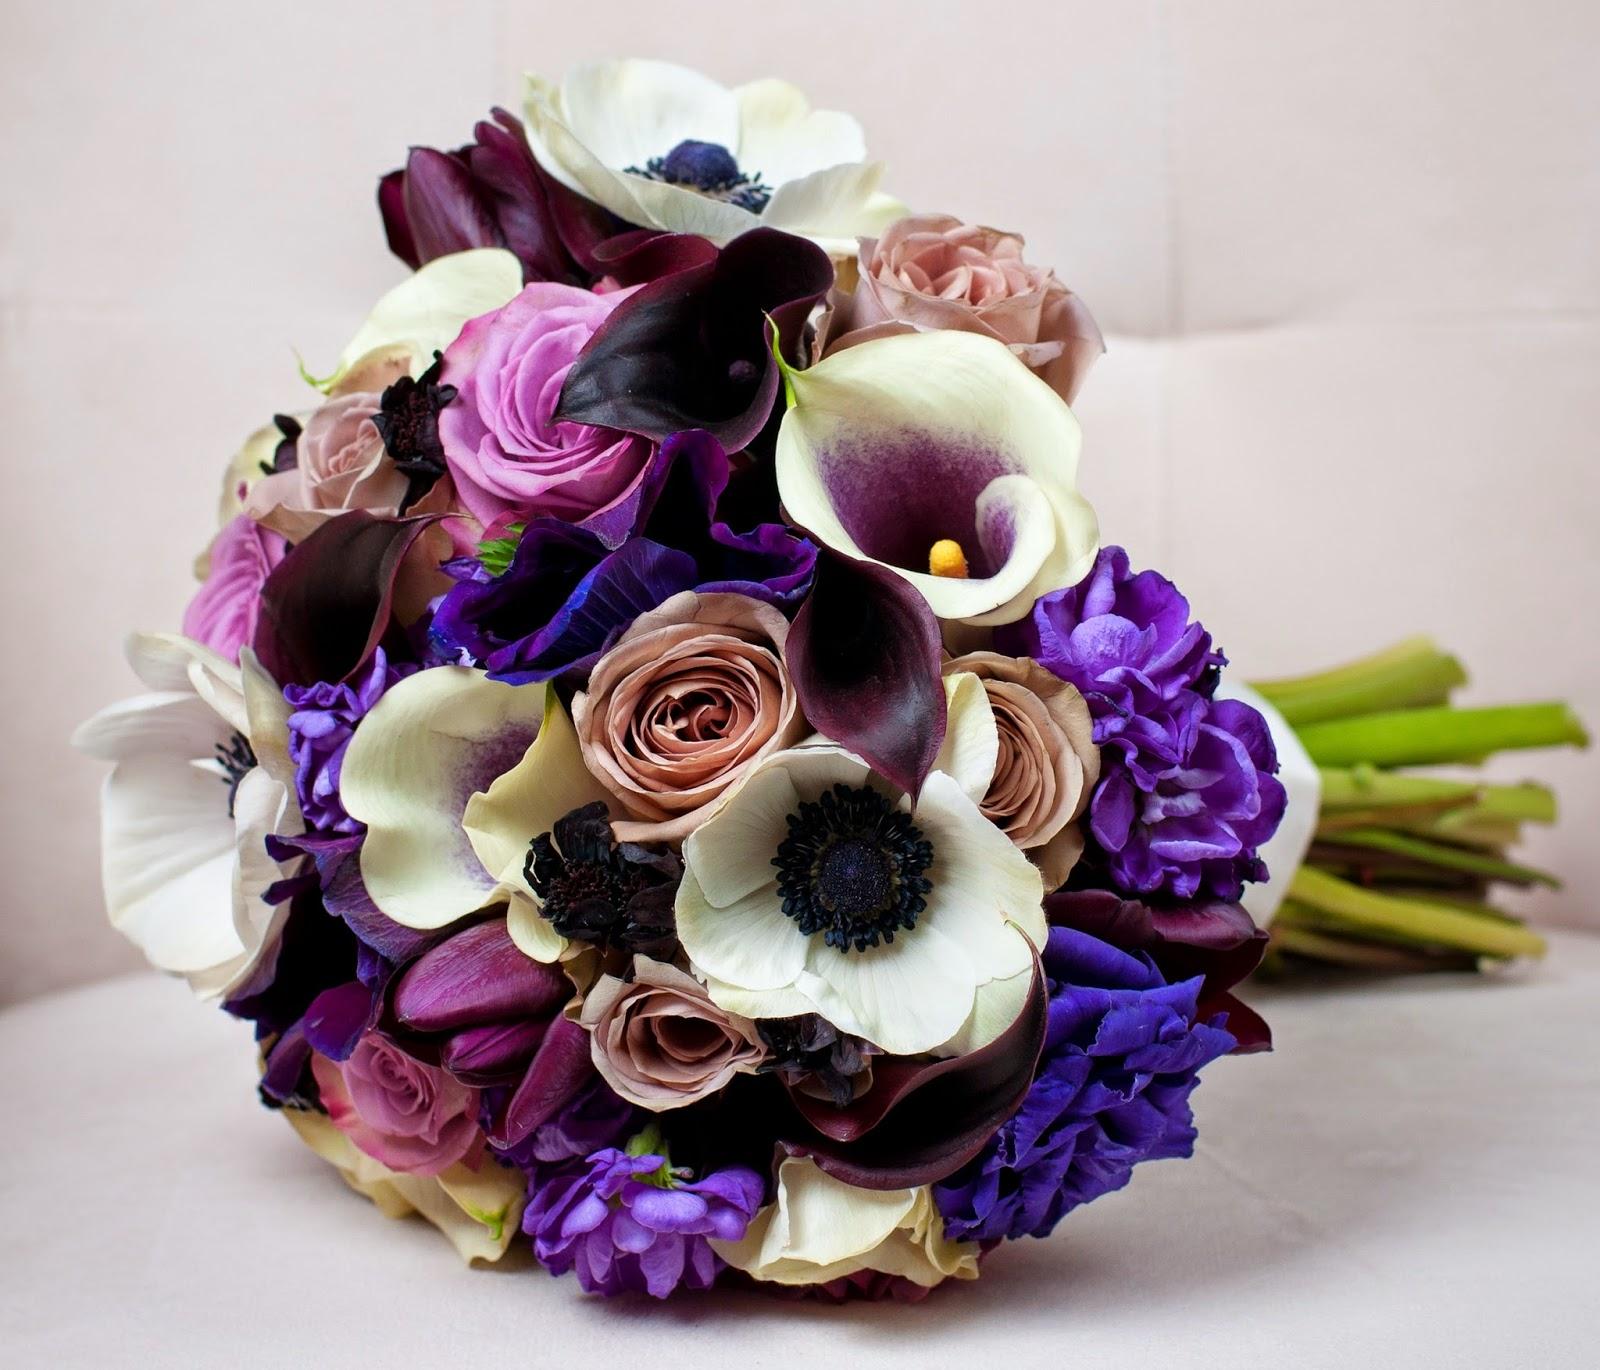 Purple anemone flower bouquethttprefreshrosespot blue anemone bouquet izmirmasajfo